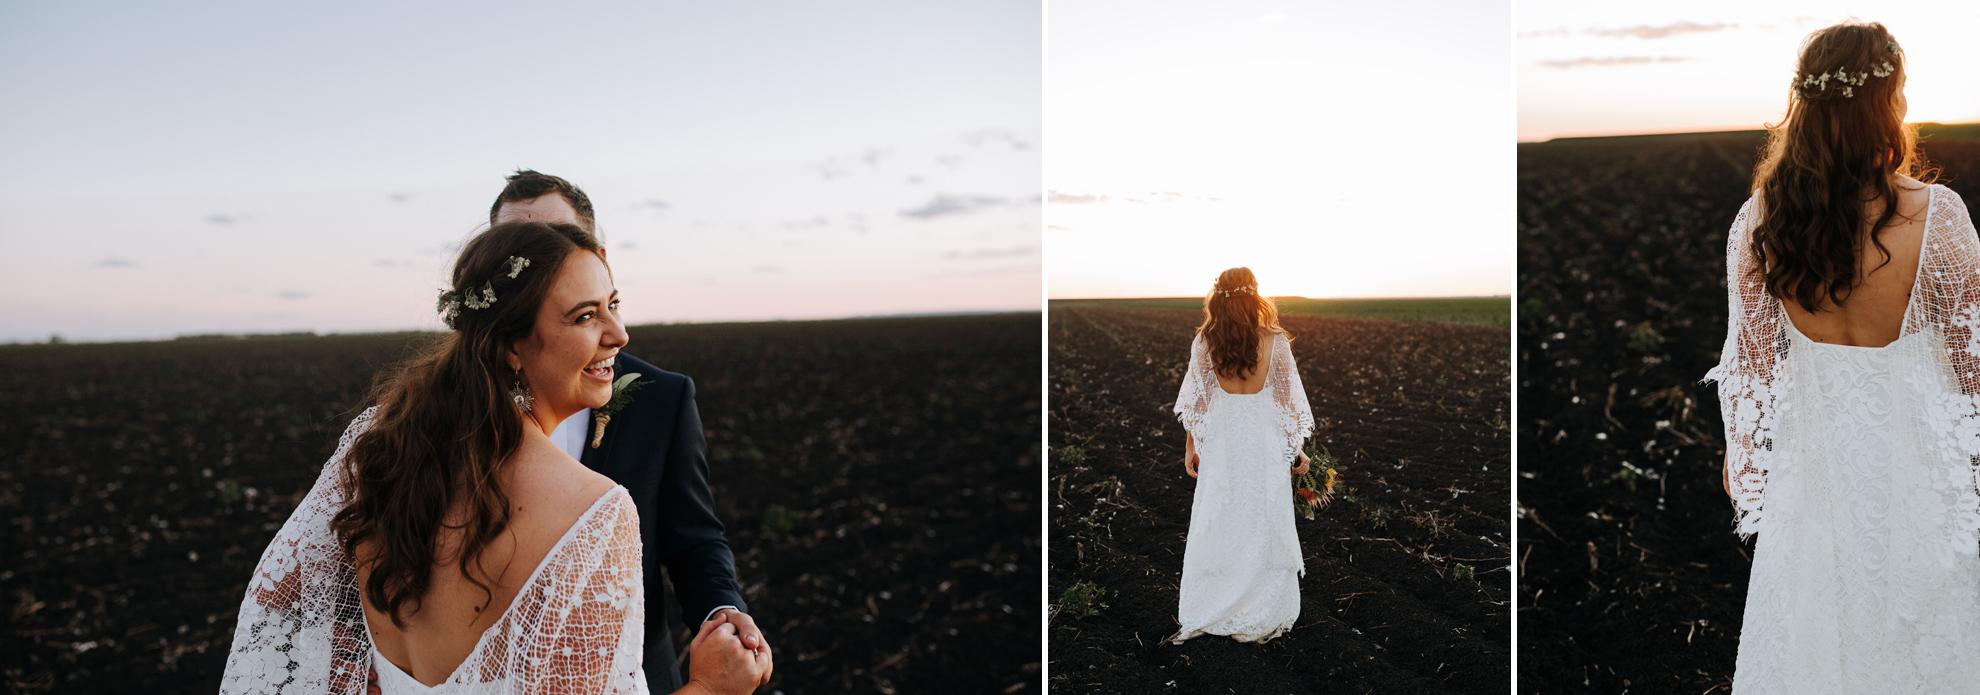 069-Jason_Jessie_Dalby_Country_Wedding.jpg